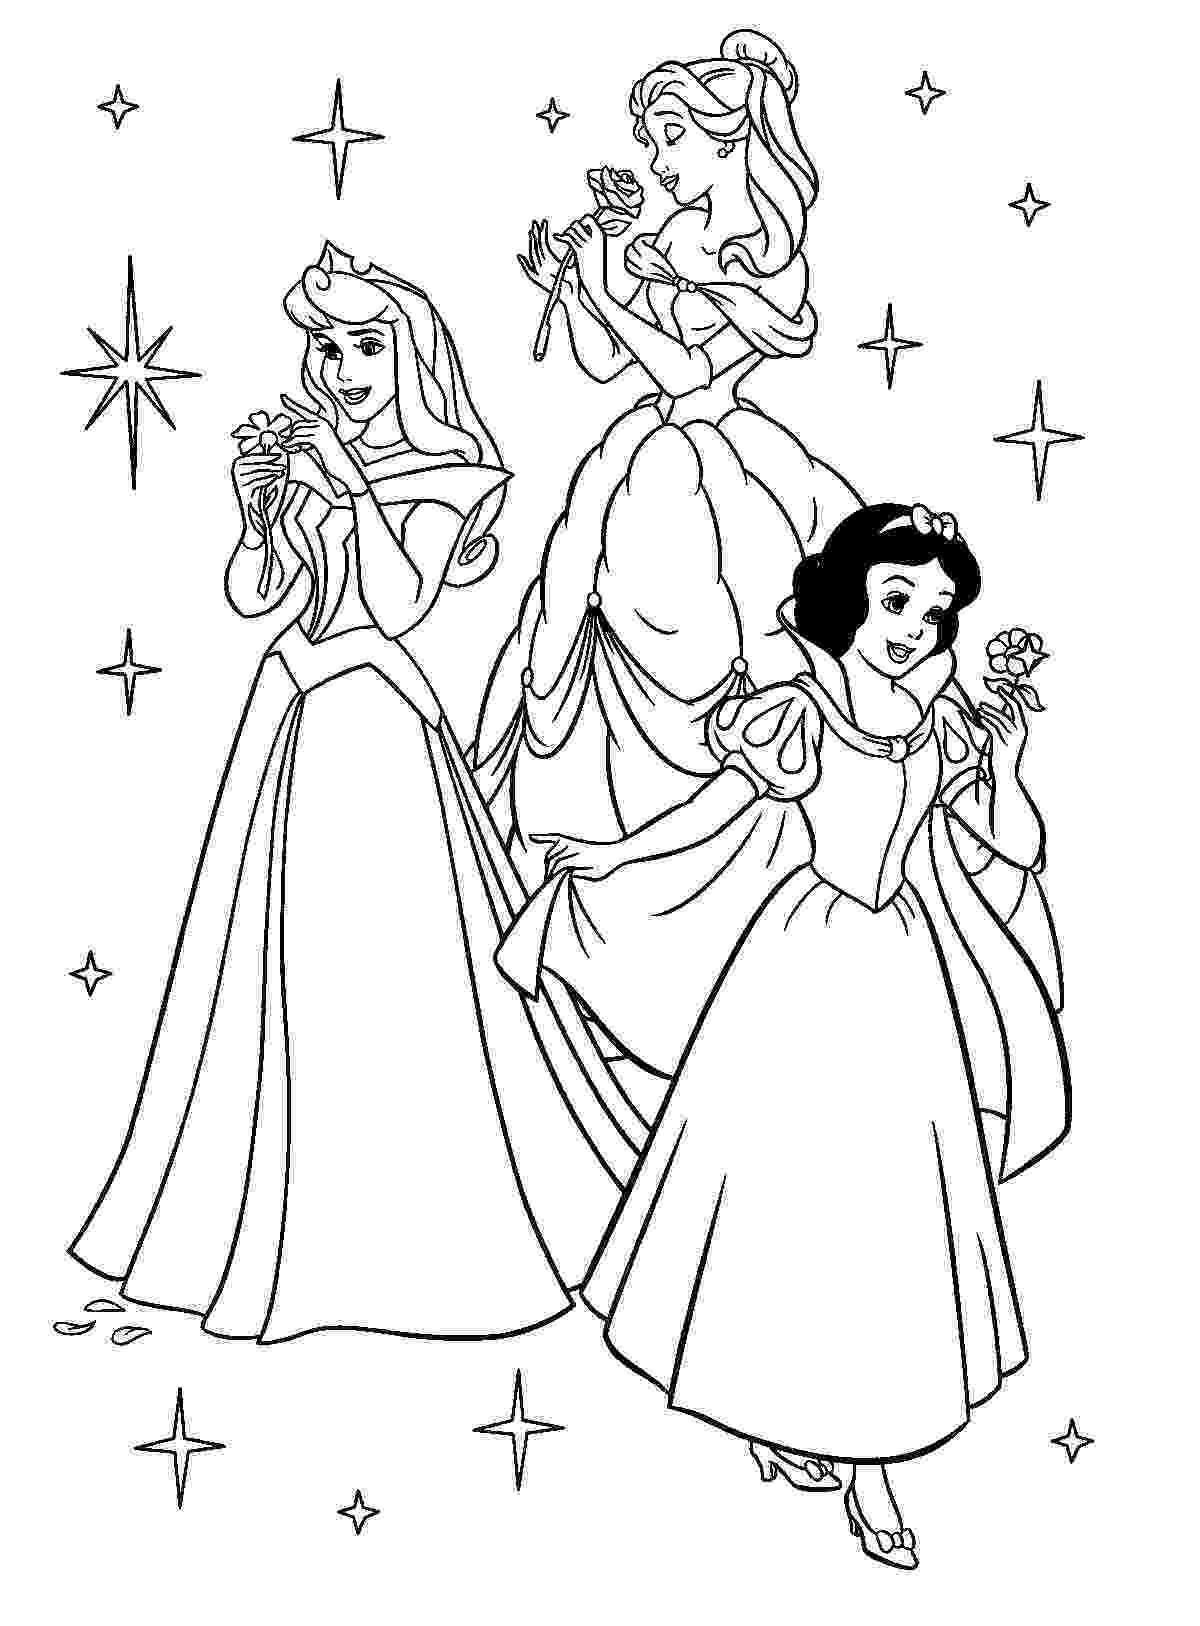 princess coloring sheets baby princess coloring pages to download and print for free sheets coloring princess